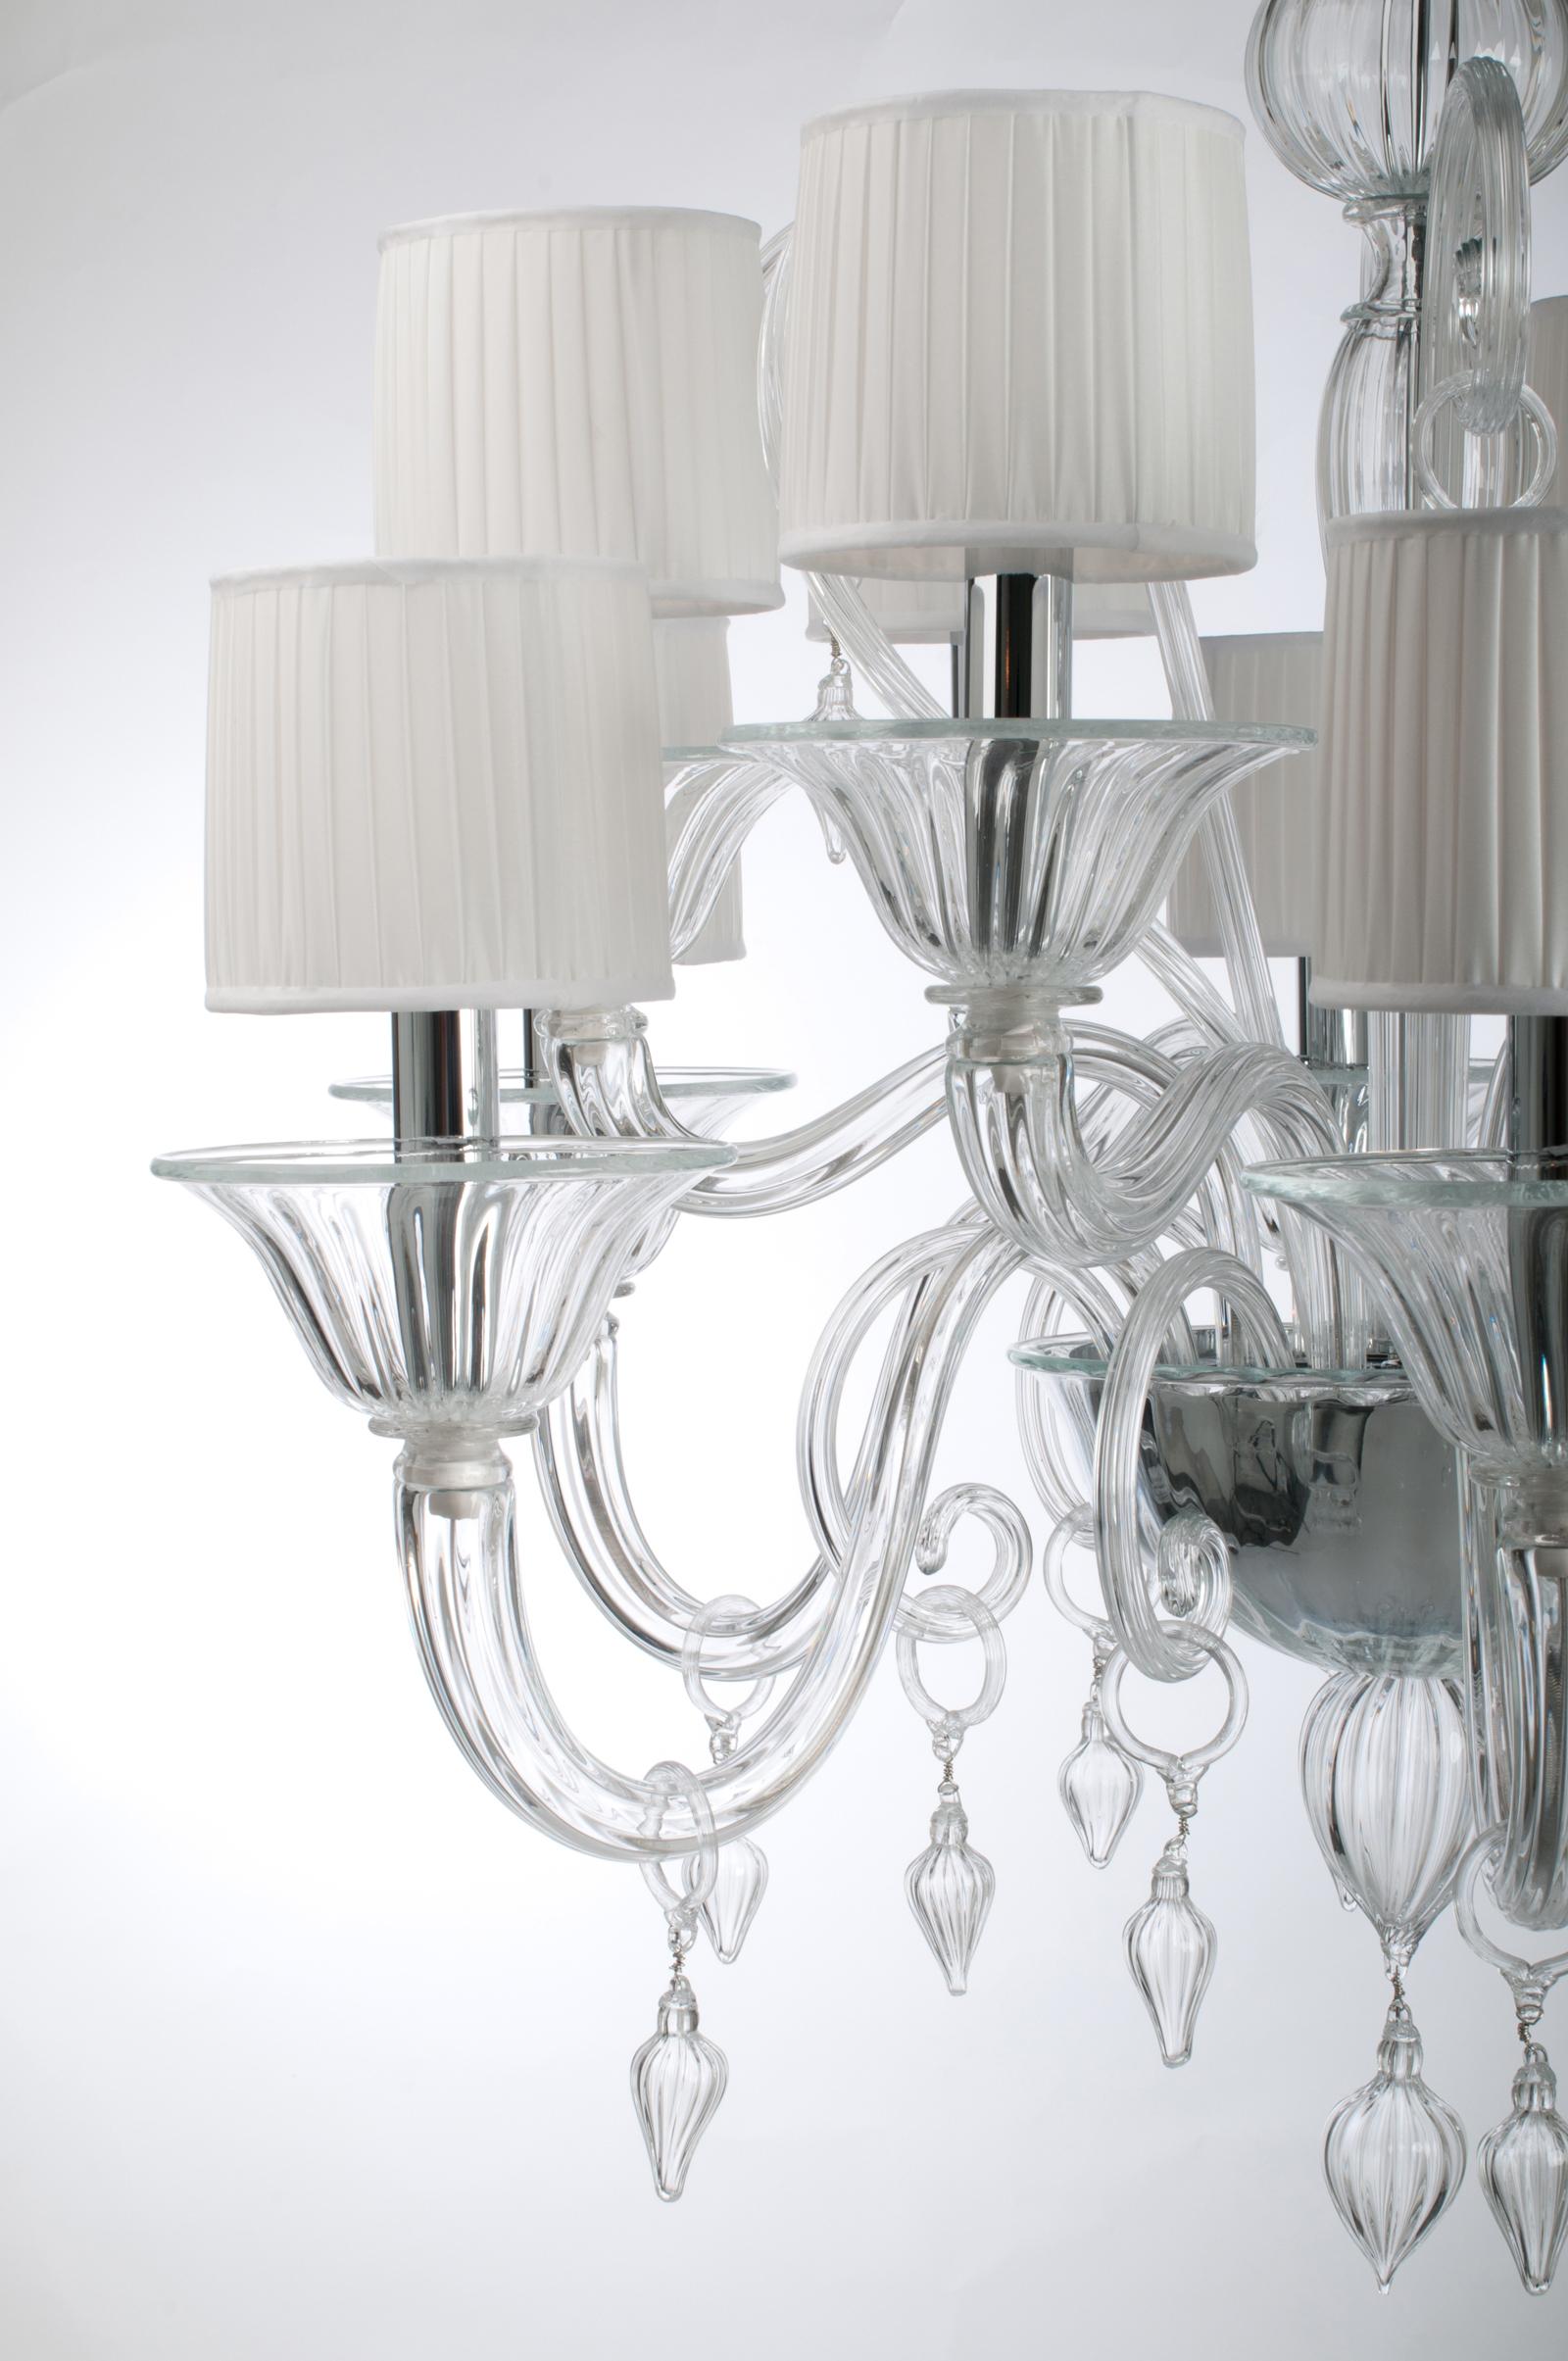 cachemire-lustre-chandelier-veronese-5.jpg